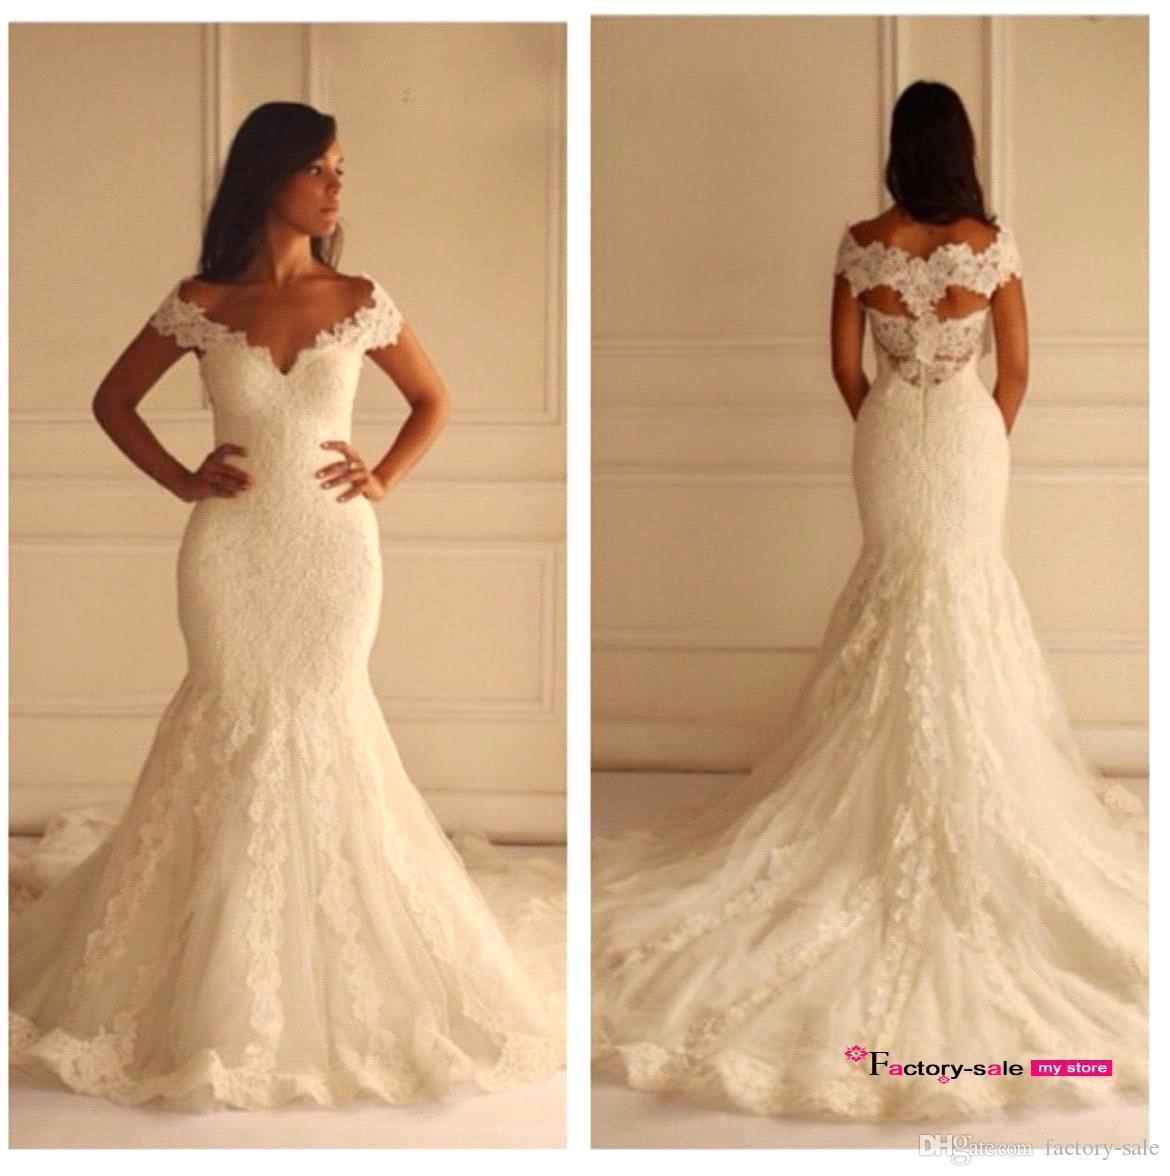 lace wedding dresses 2019 Sexy Mermaid Wedding Dresses Off the Shoulder V Neckline Lace Appliques Sweep Train Zipper Back Bridal Gowns